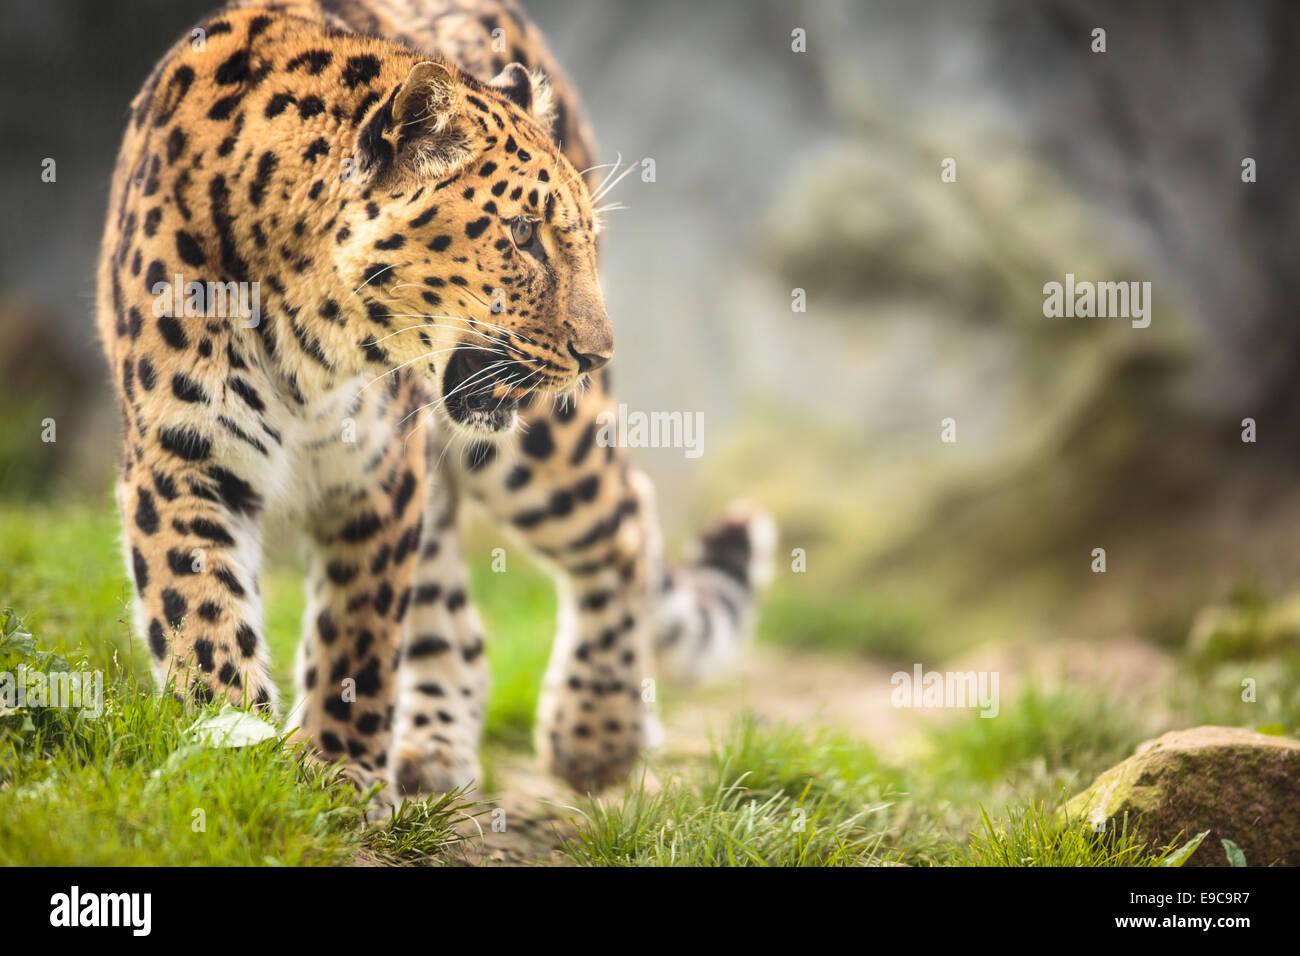 Amur Leopard (Panthera pardus orientalis) - Stock Image